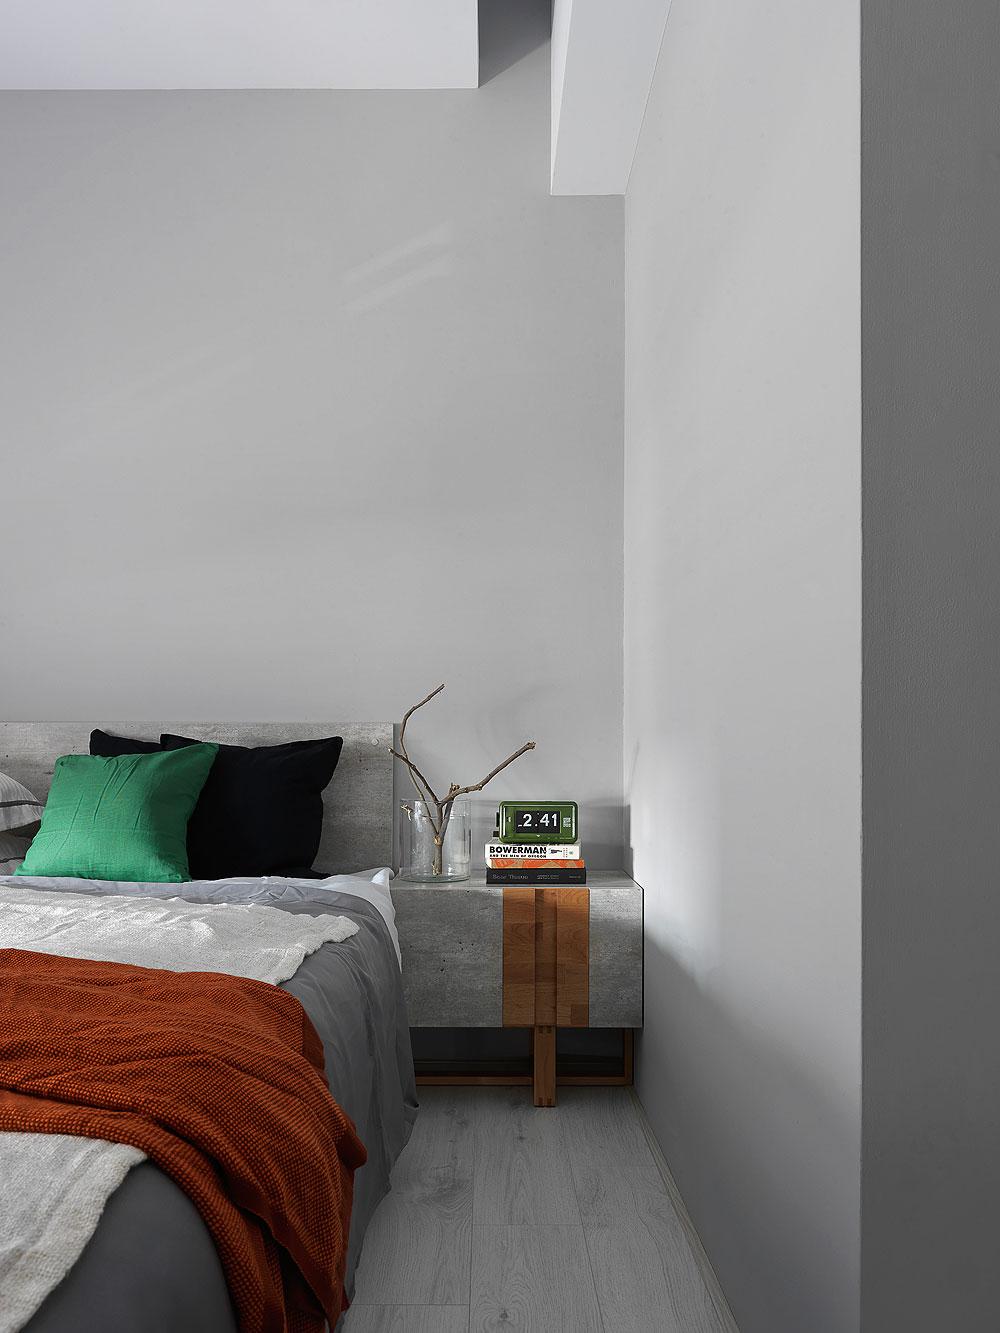 h-residence-z-axis-design (19)